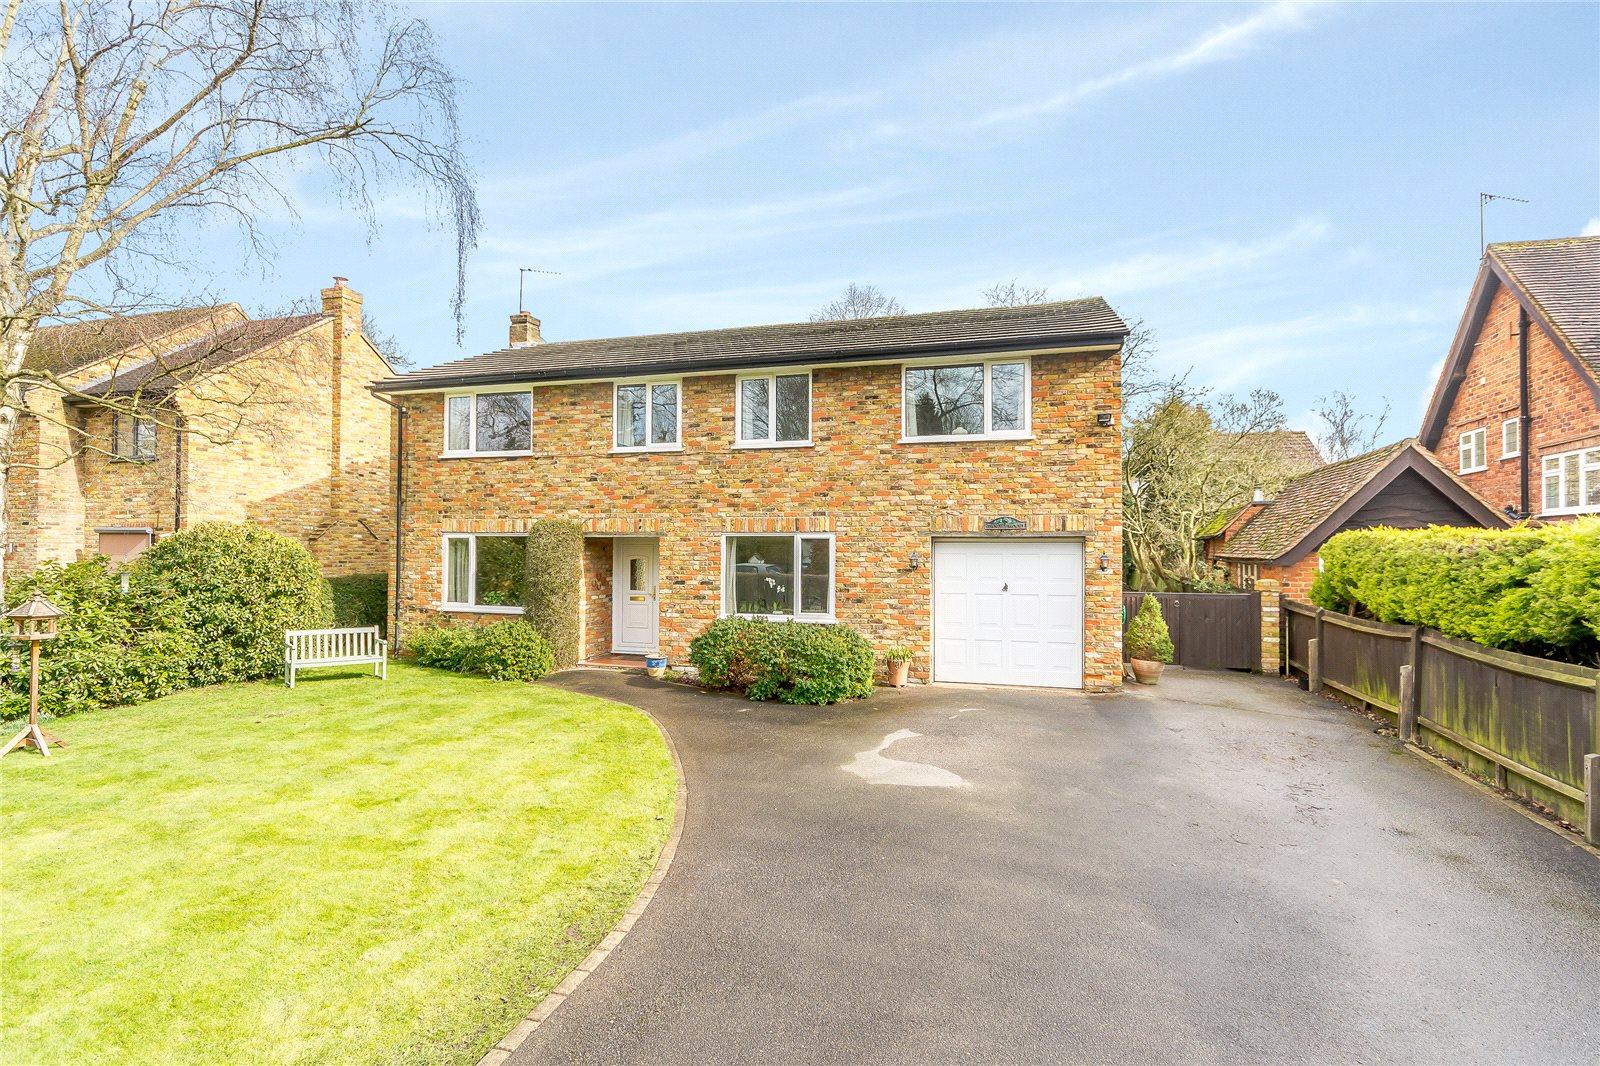 独户住宅 为 销售 在 Upway, Chalfont St. Peter, Gerrards Cross, Buckinghamshire, SL9 Gerrards Cross, 英格兰